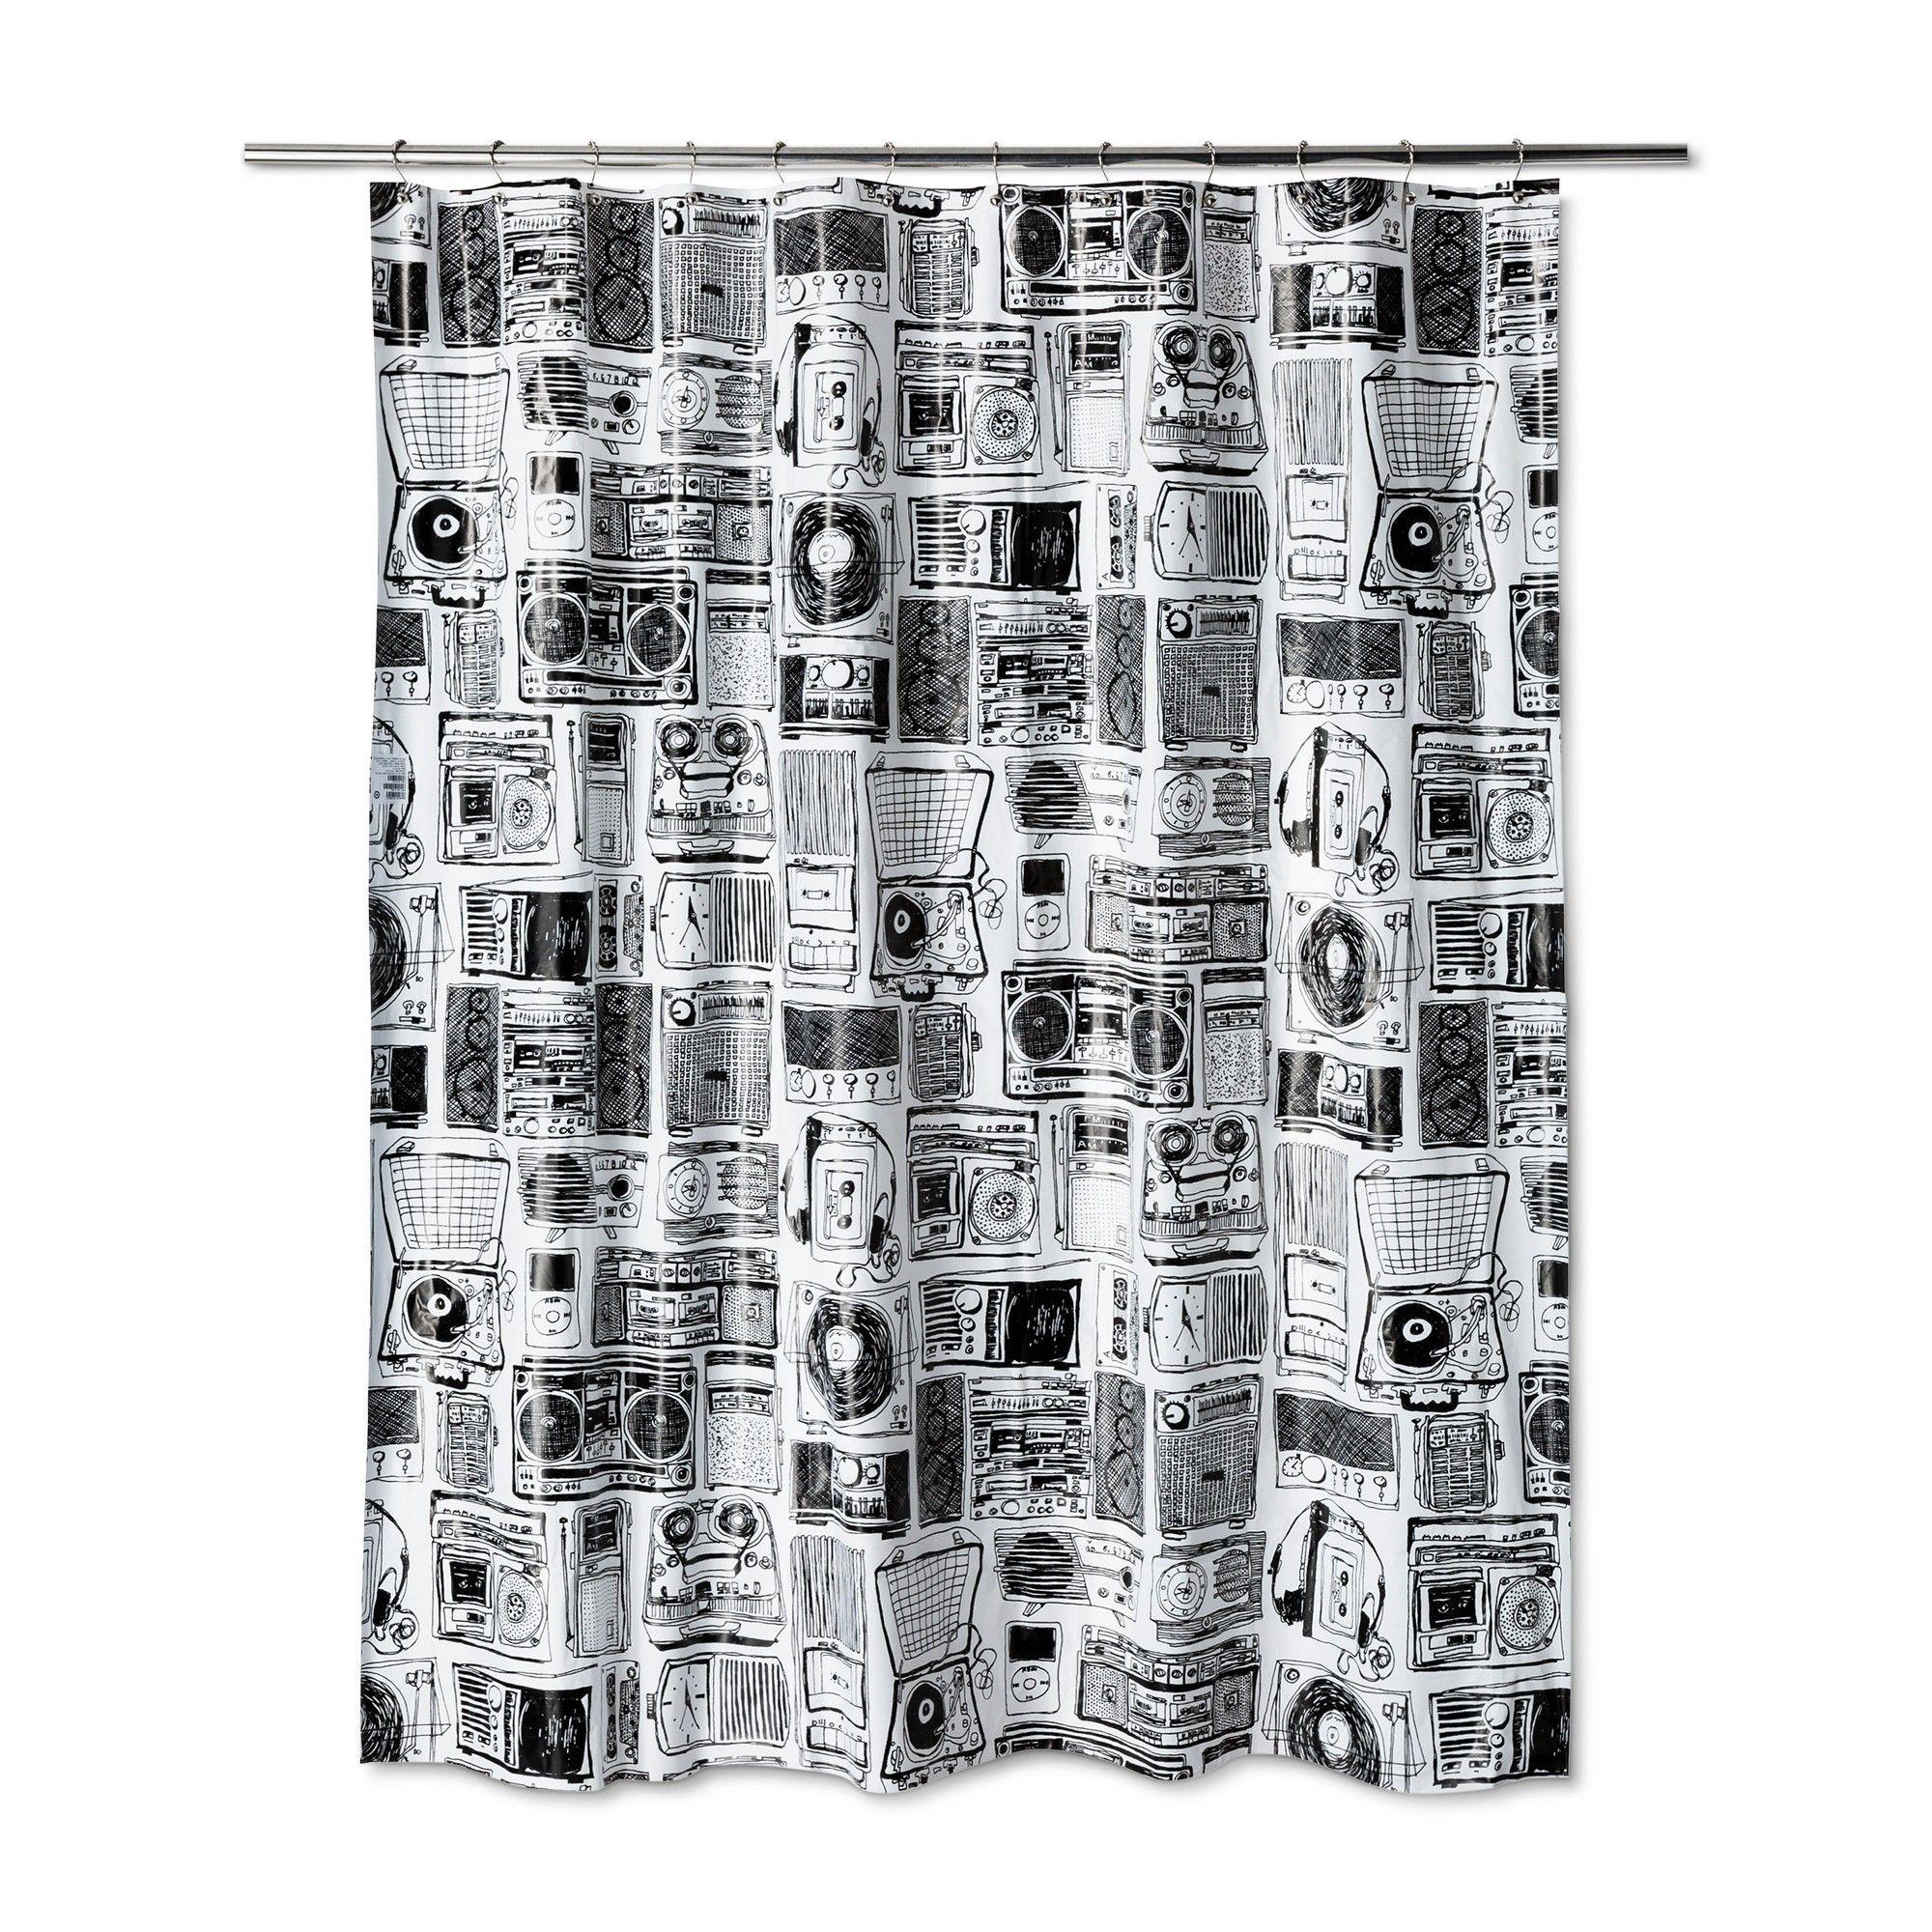 Retro Style Shower Curtain Black Room Essentials Room